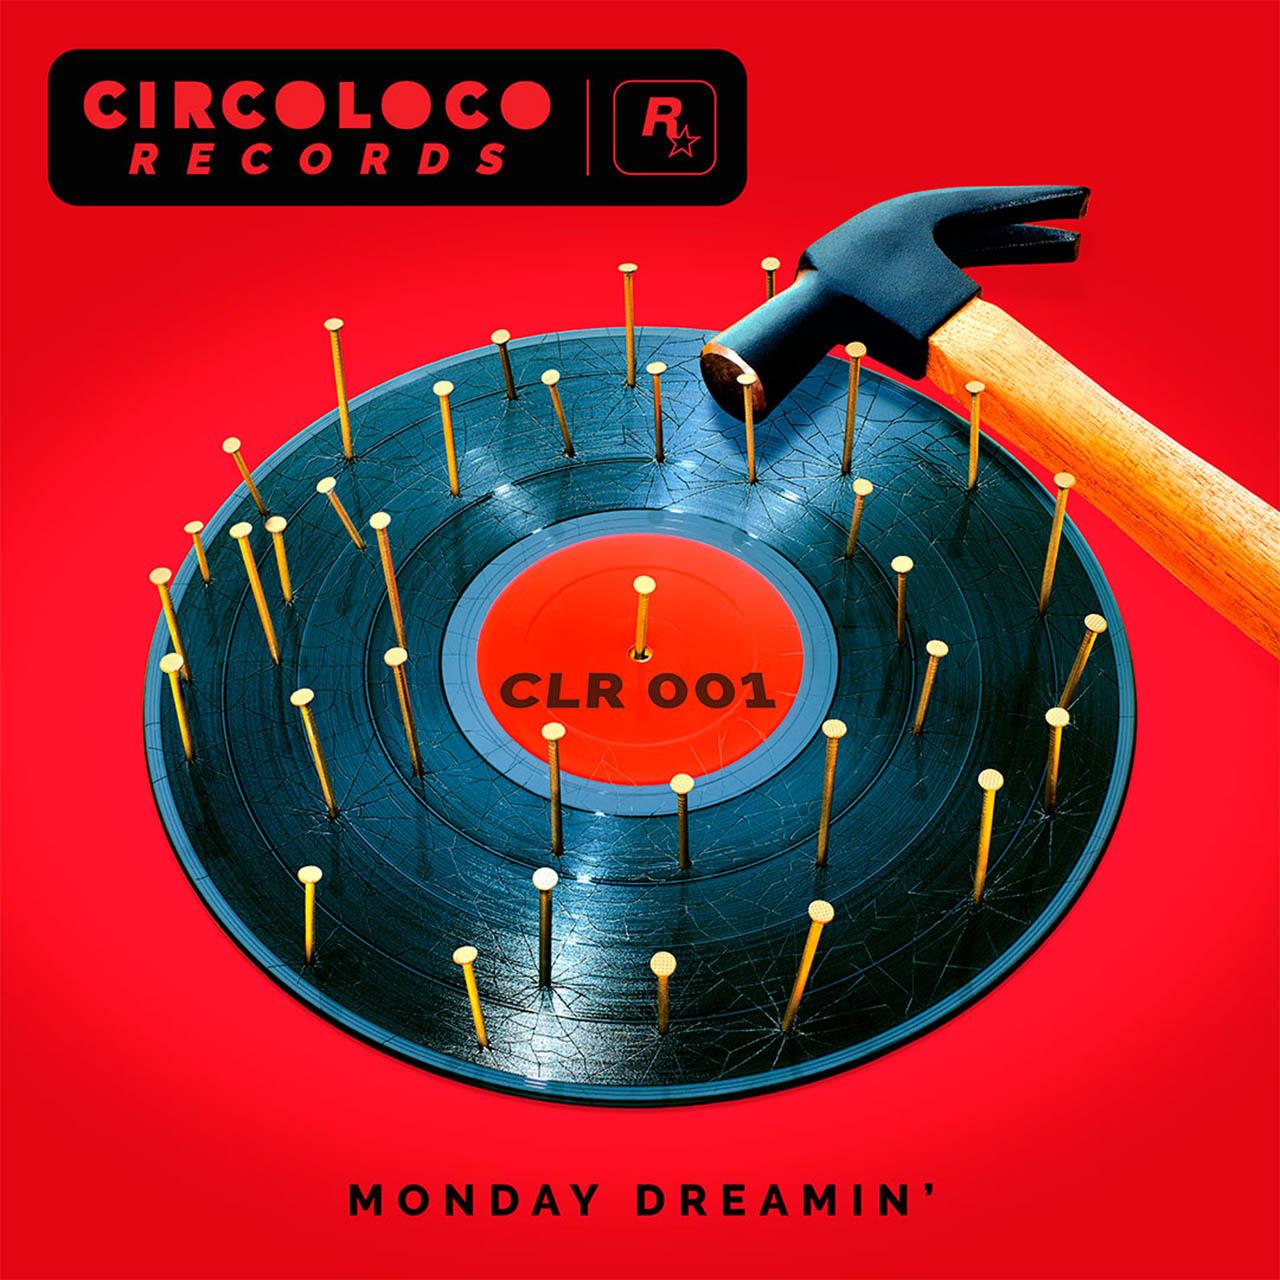 Circoloco Records - Rockstar Games